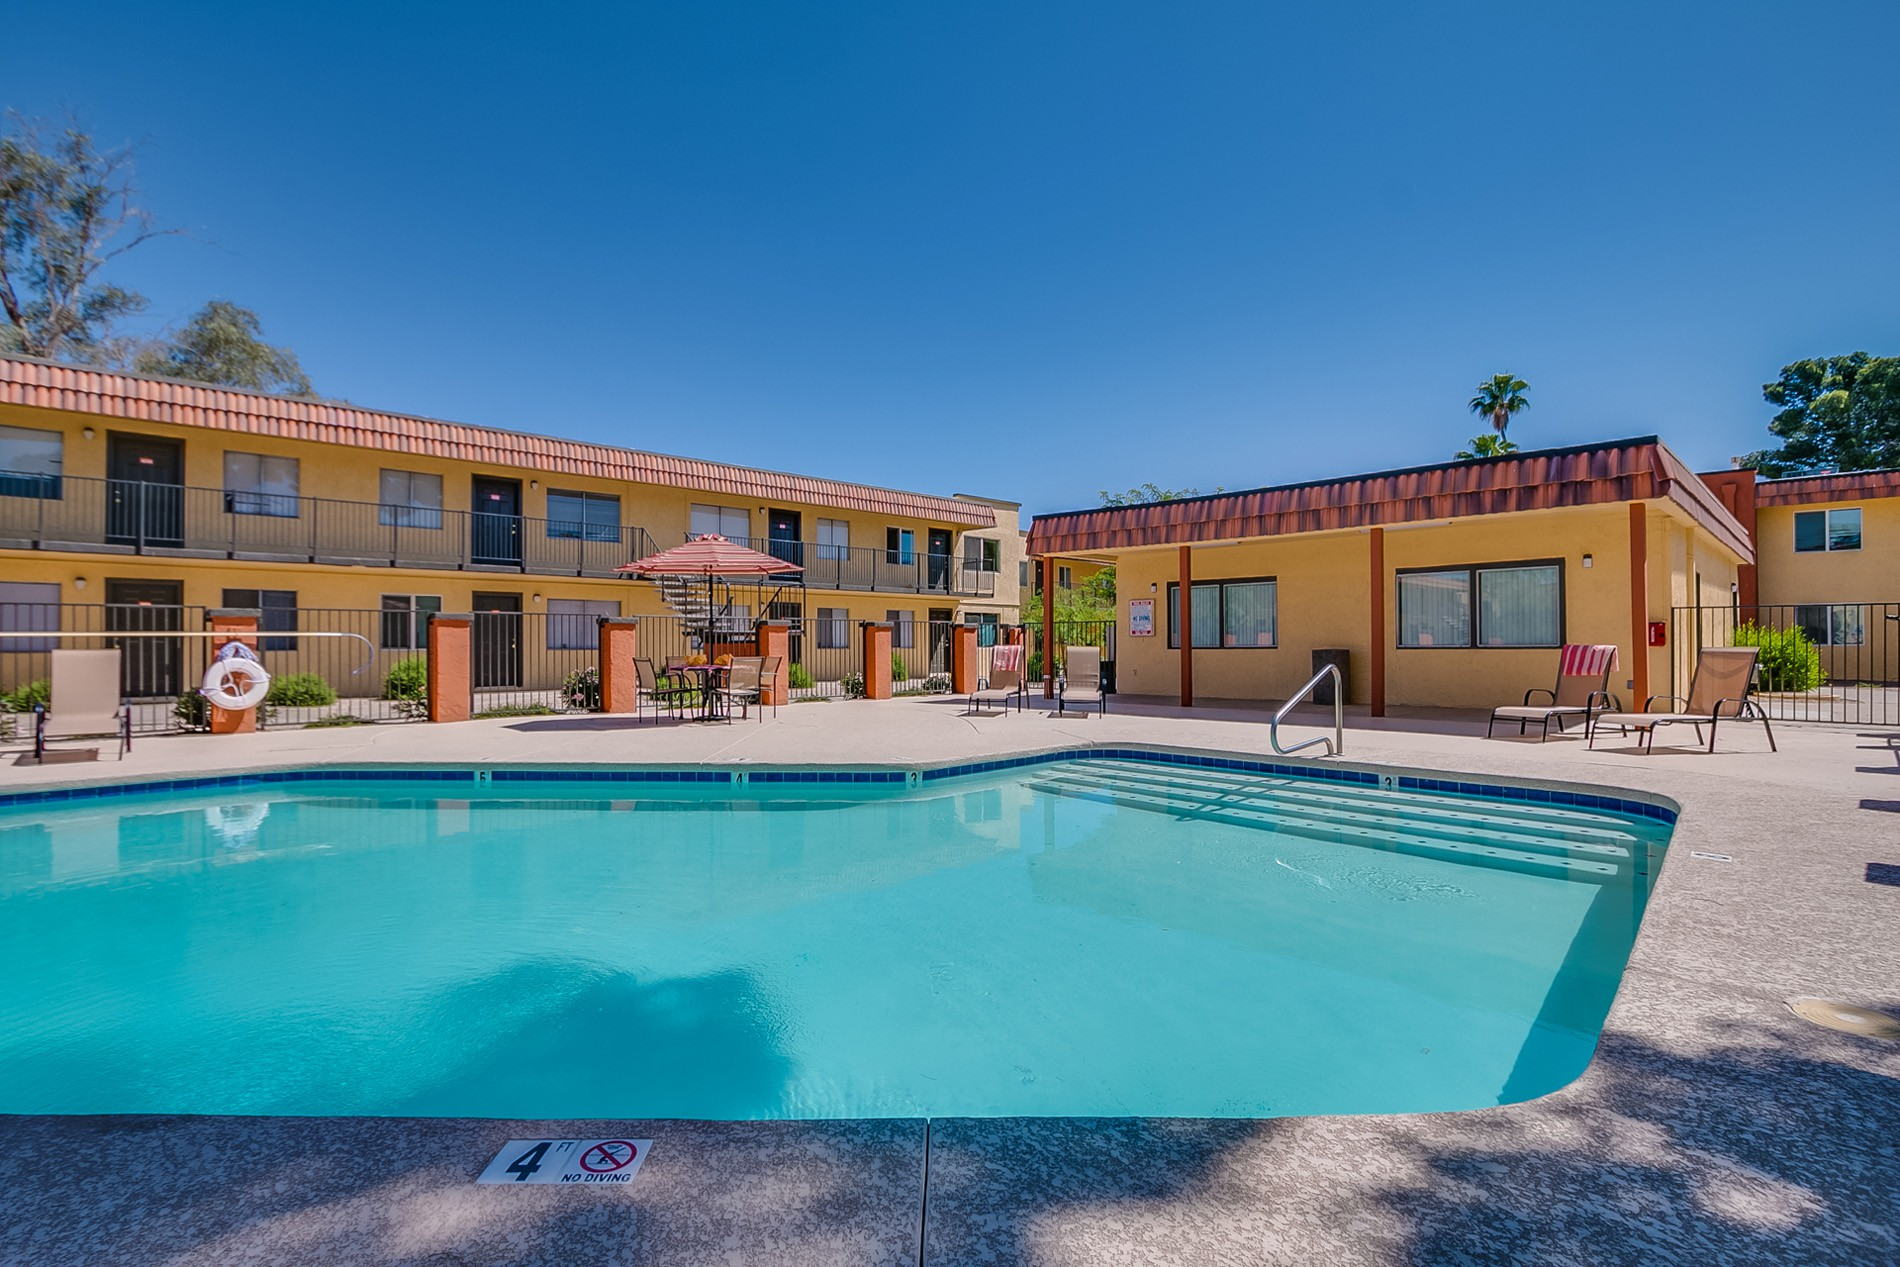 Apartments Near GCU 19 APTS for Grand Canyon University Students in Phoenix, AZ